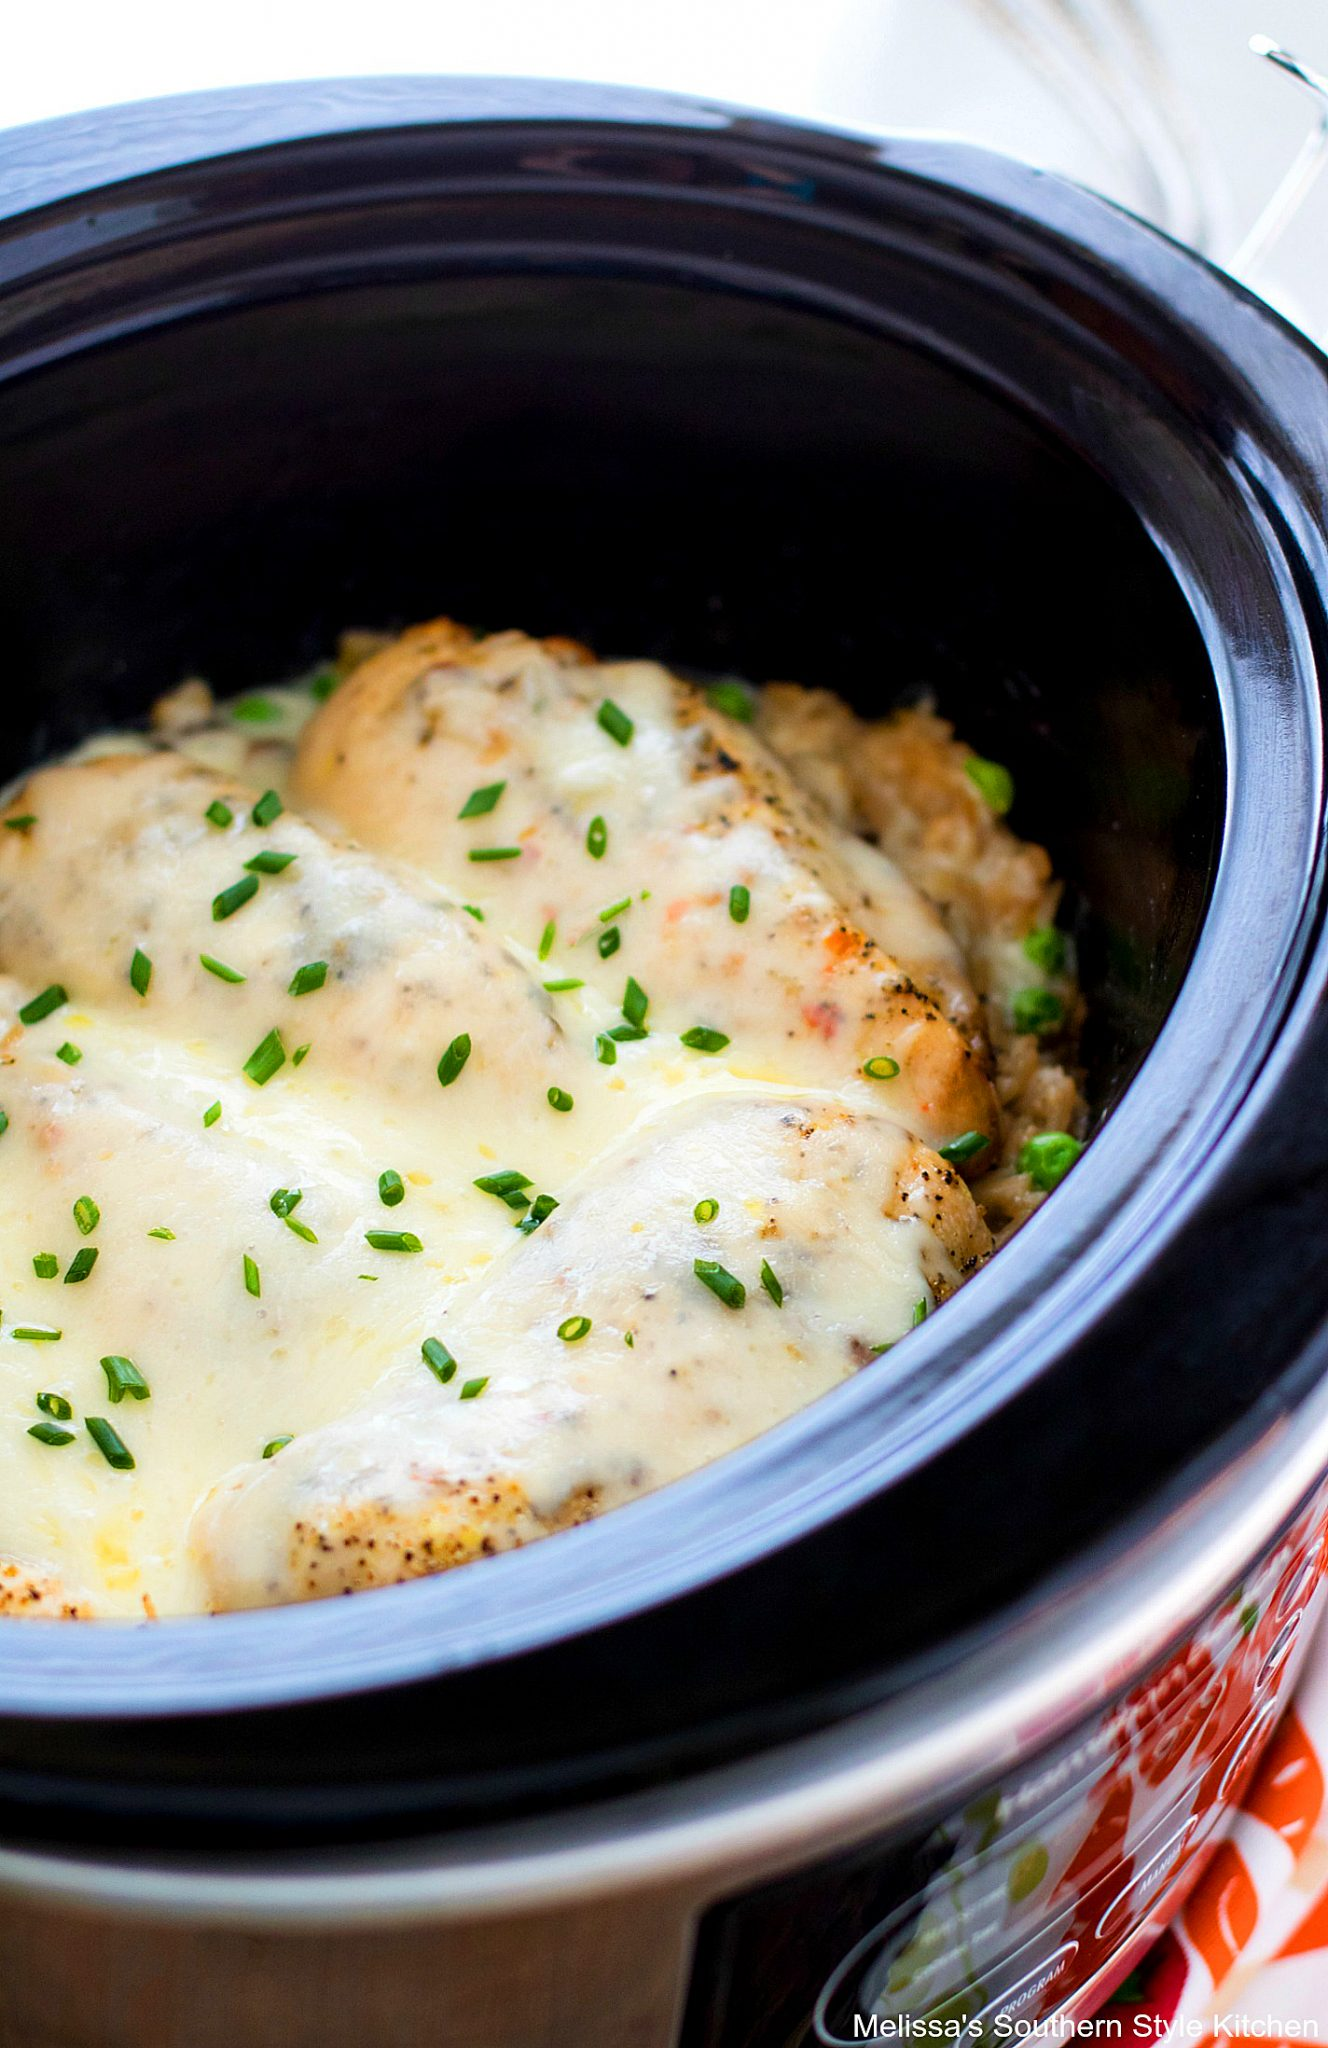 Crockpot Chicken And Rice Melissassouthernstylekitchen Com